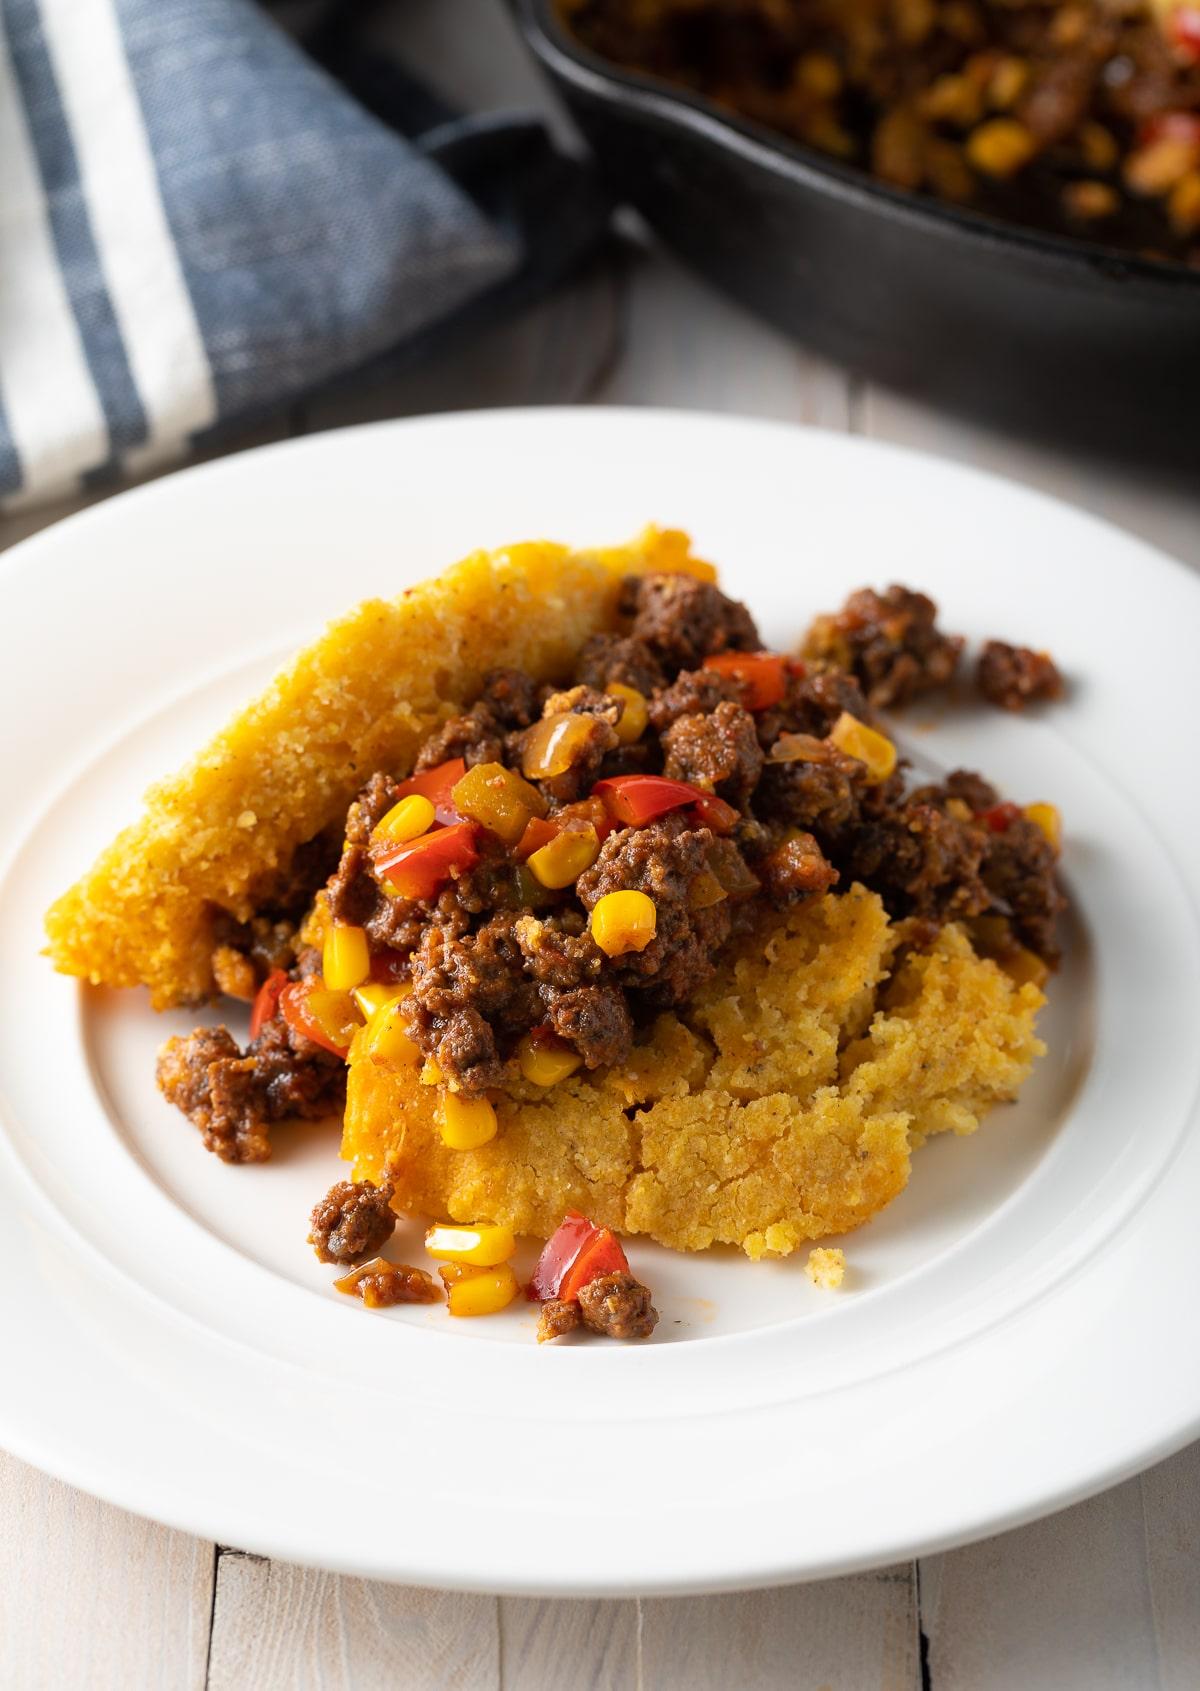 Awesome Tamale Pie Recipe - Easy to Make and Gluten Free! #tamales #tamalepie #glutenfreedinner #glutenfreerecipe #aspicyperspective